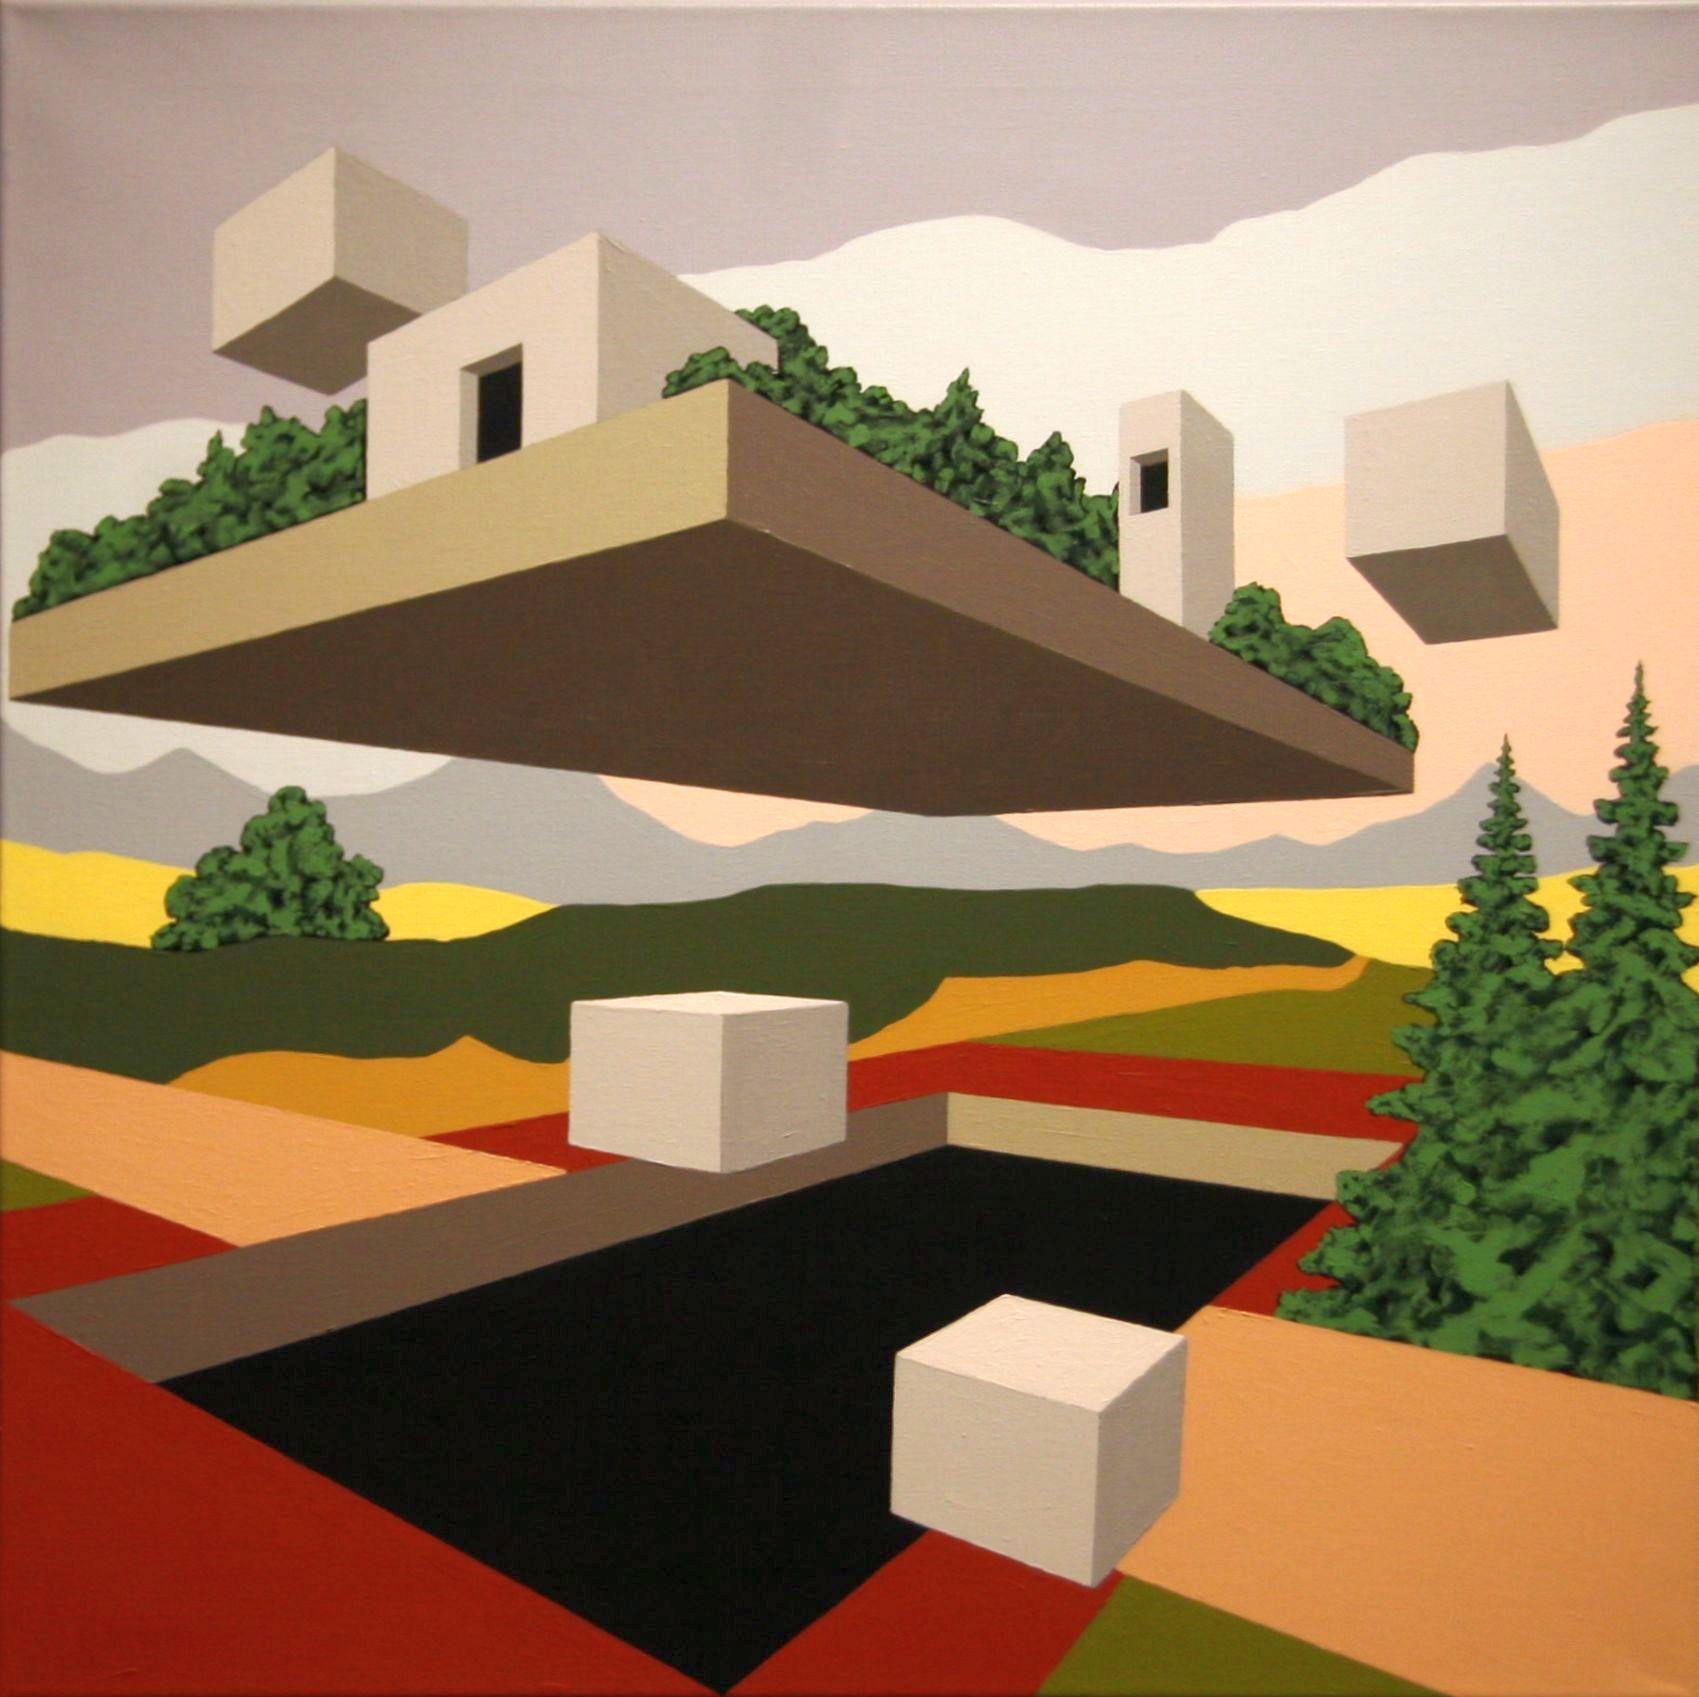 Martin Koroscha (Bremen): 6.10 I. Acryl auf Baumwolle, 70 x 70 cm, 2010.